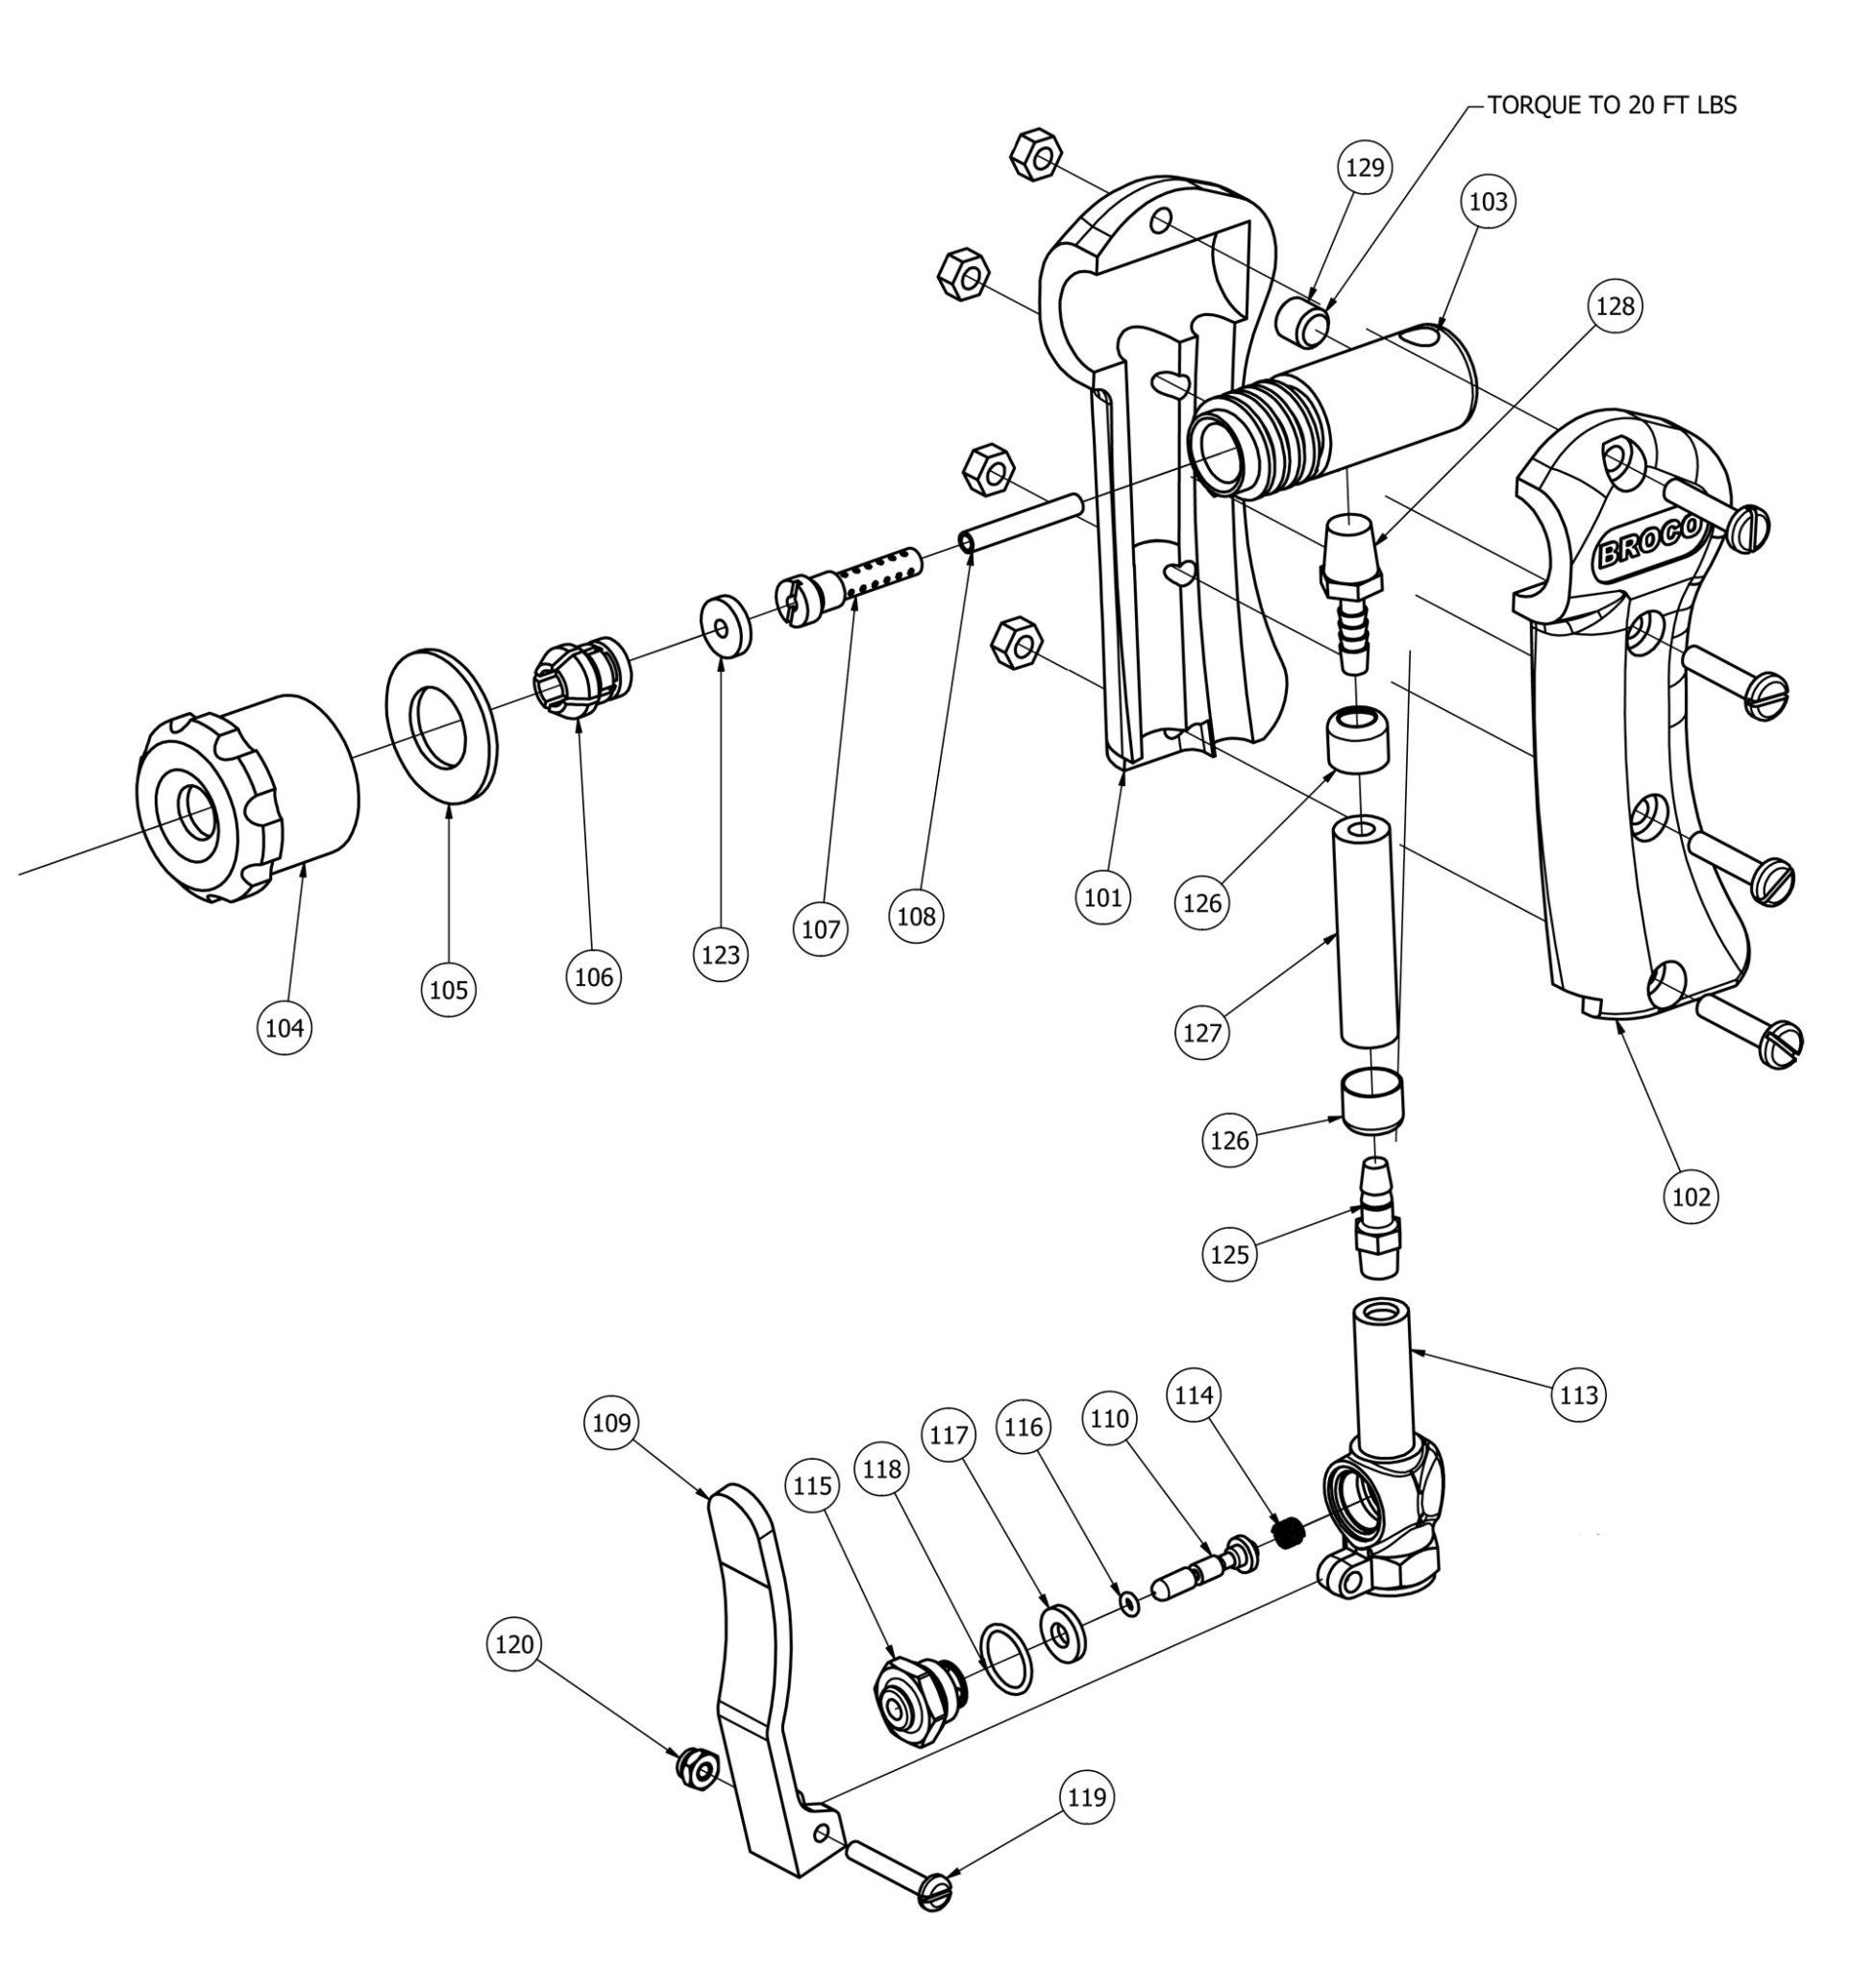 scuba gear diagram 1981 toyota truck wiring oxygen regulator parts imageresizertool com